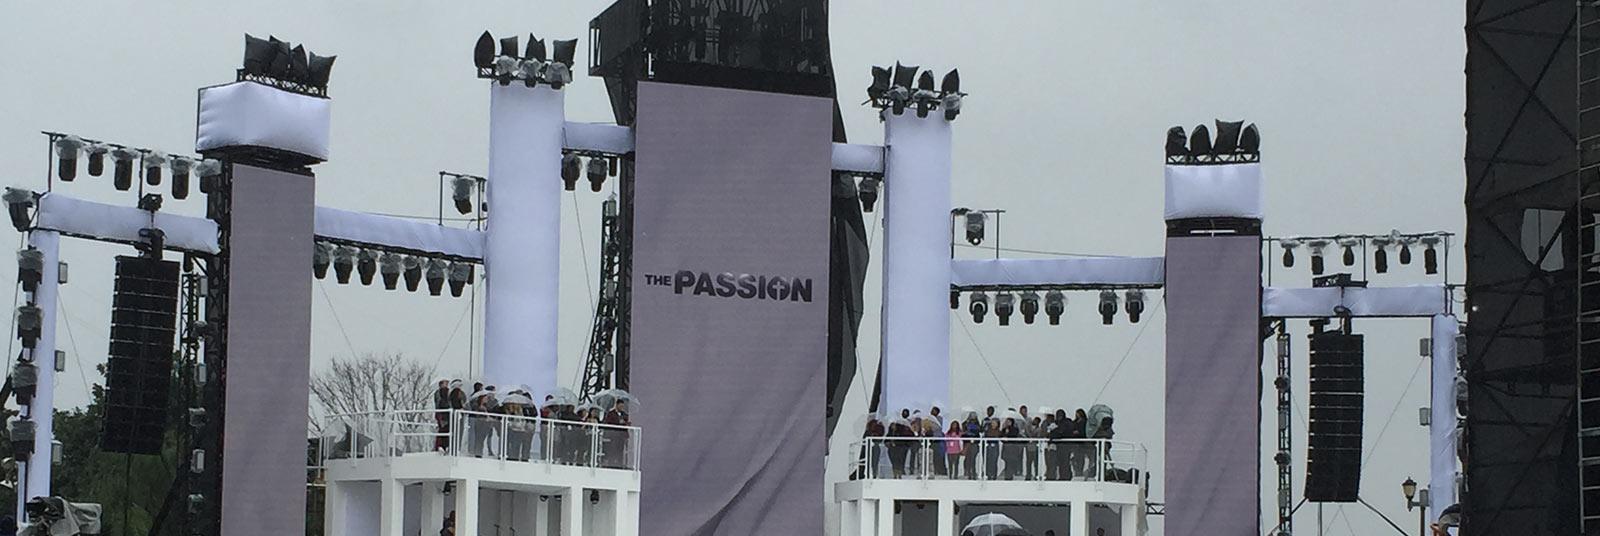 Passion_Photo-3